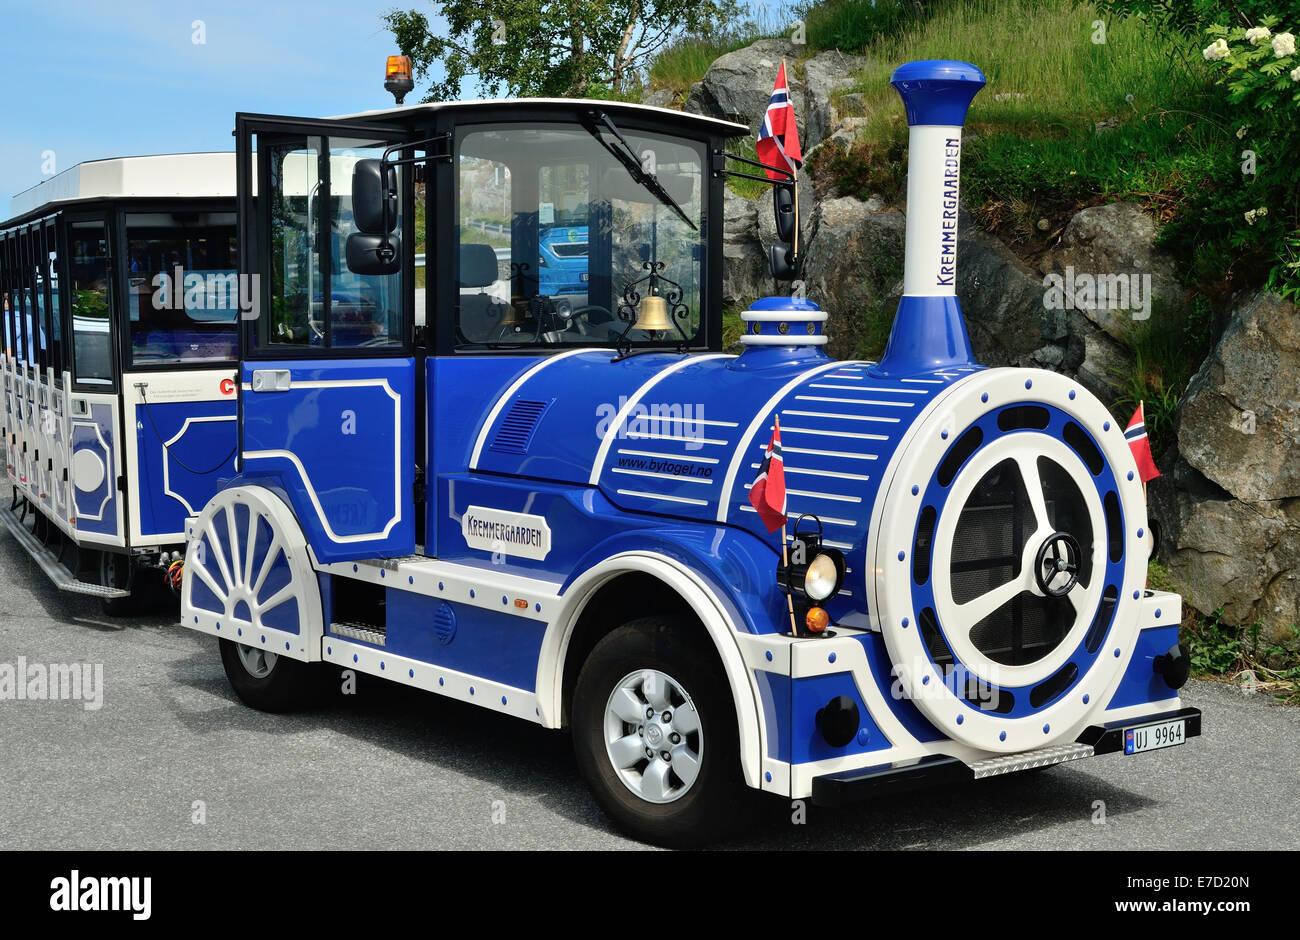 Land train. - Stock Image